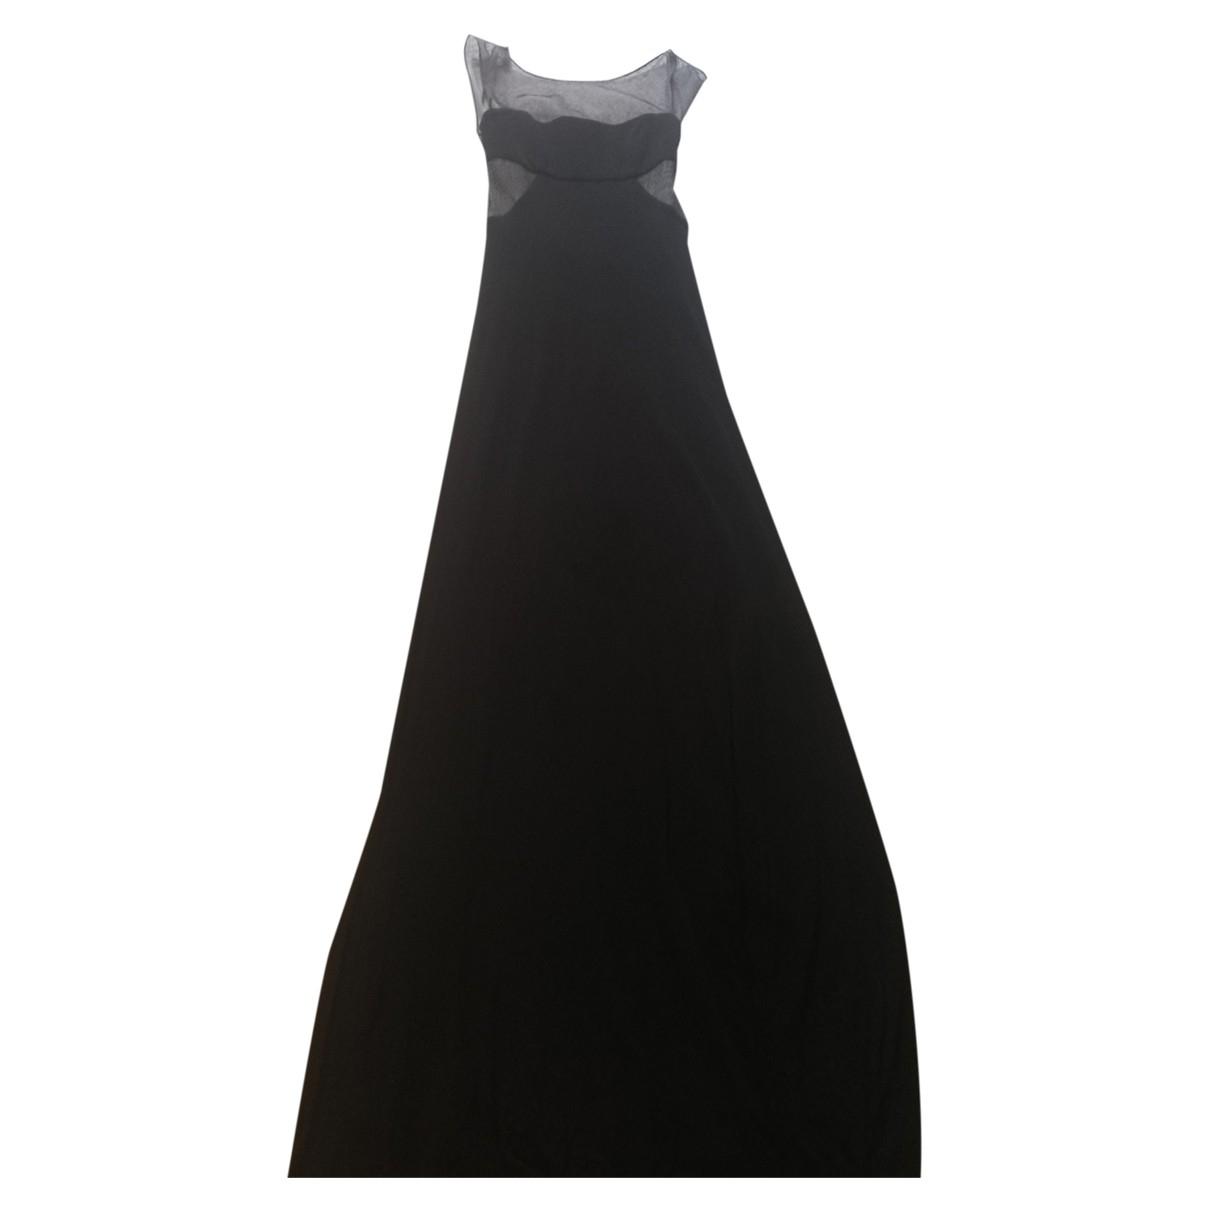 Bcbg Max Azria \N Black dress for Women 36 FR